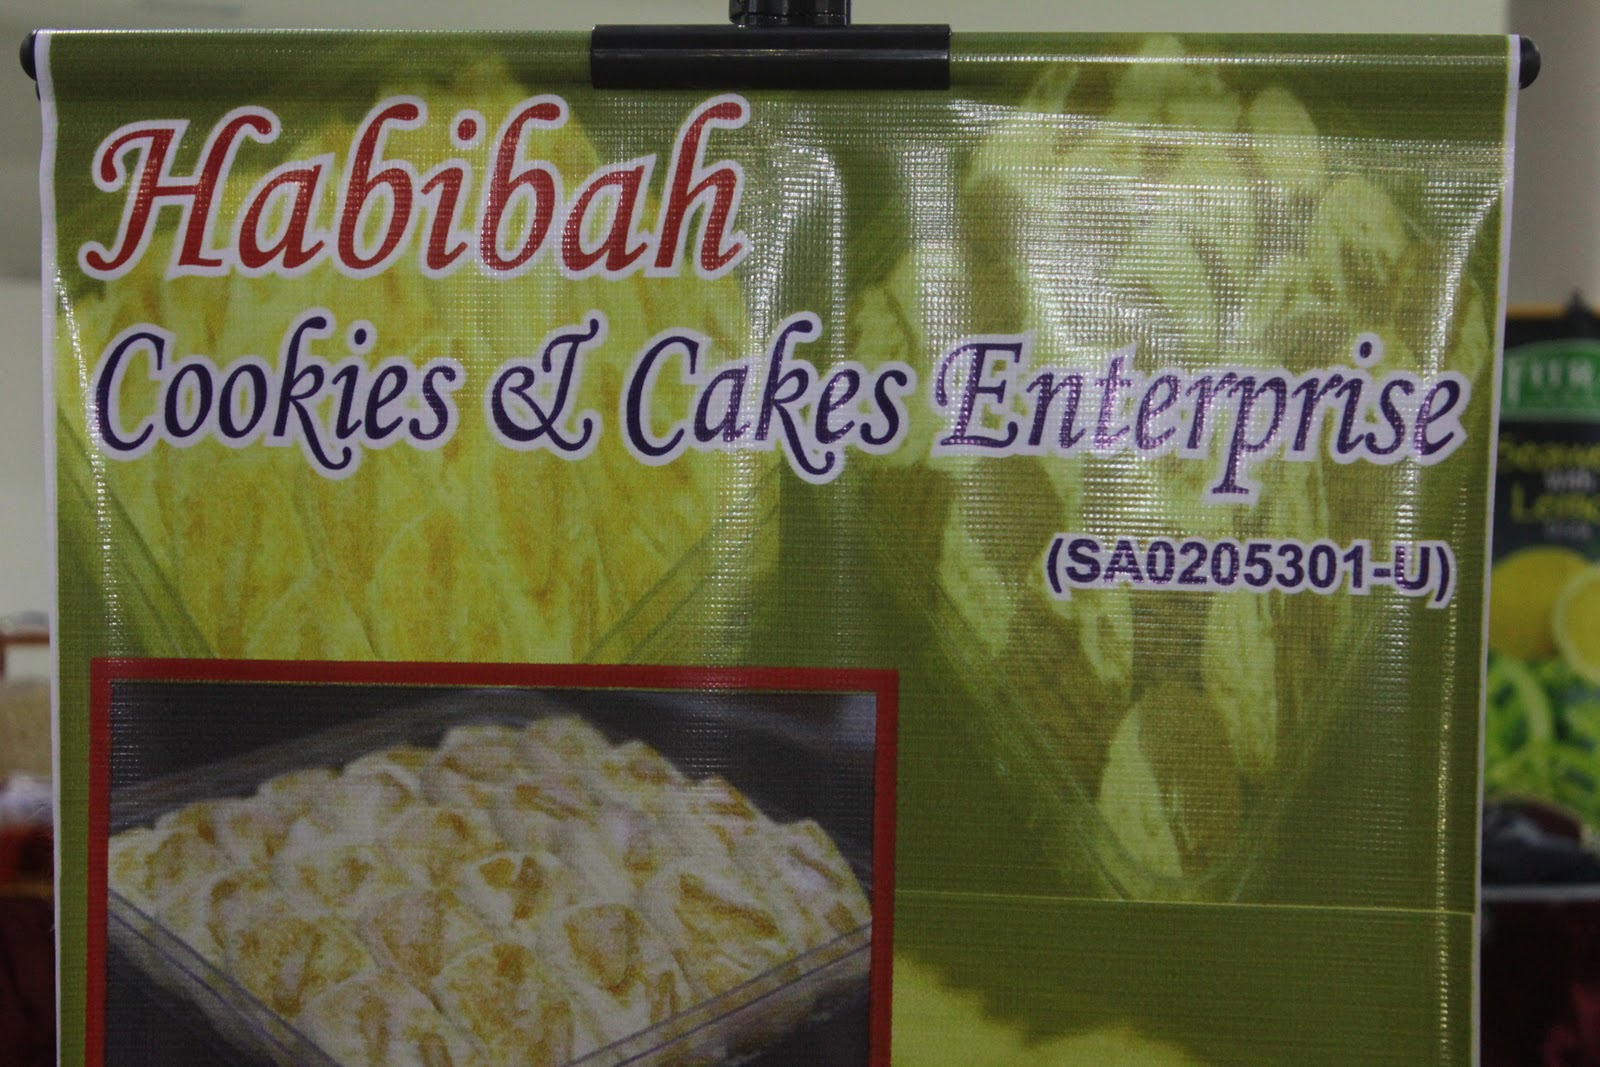 Habibah Cookies & Cakes: Promotion at Space U8, Shah Alam ...